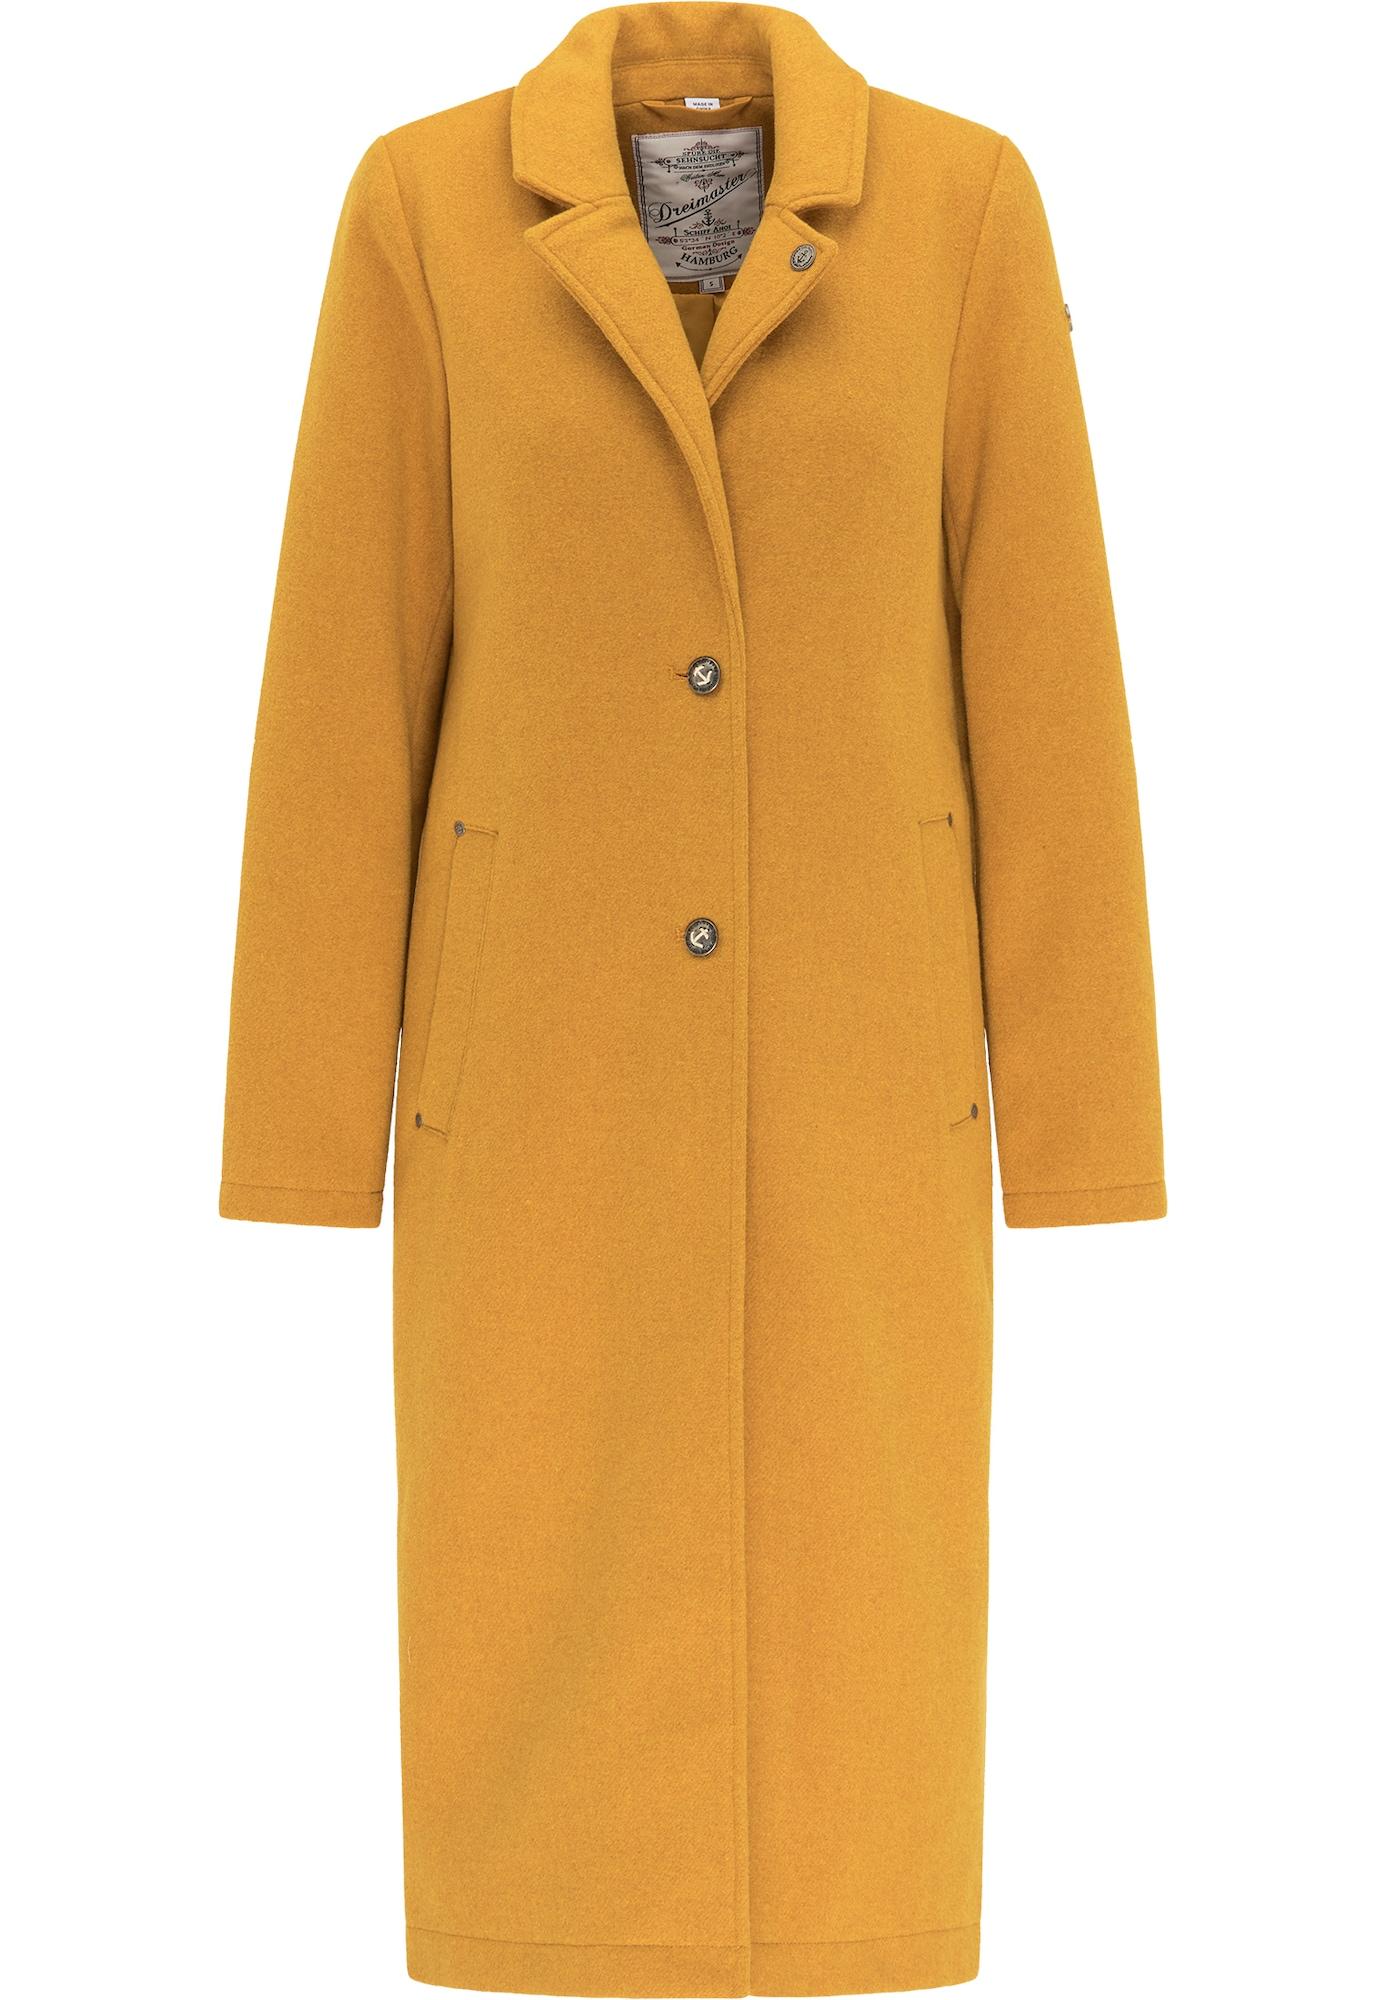 DreiMaster Vintage Demisezoninis paltas medaus spalva